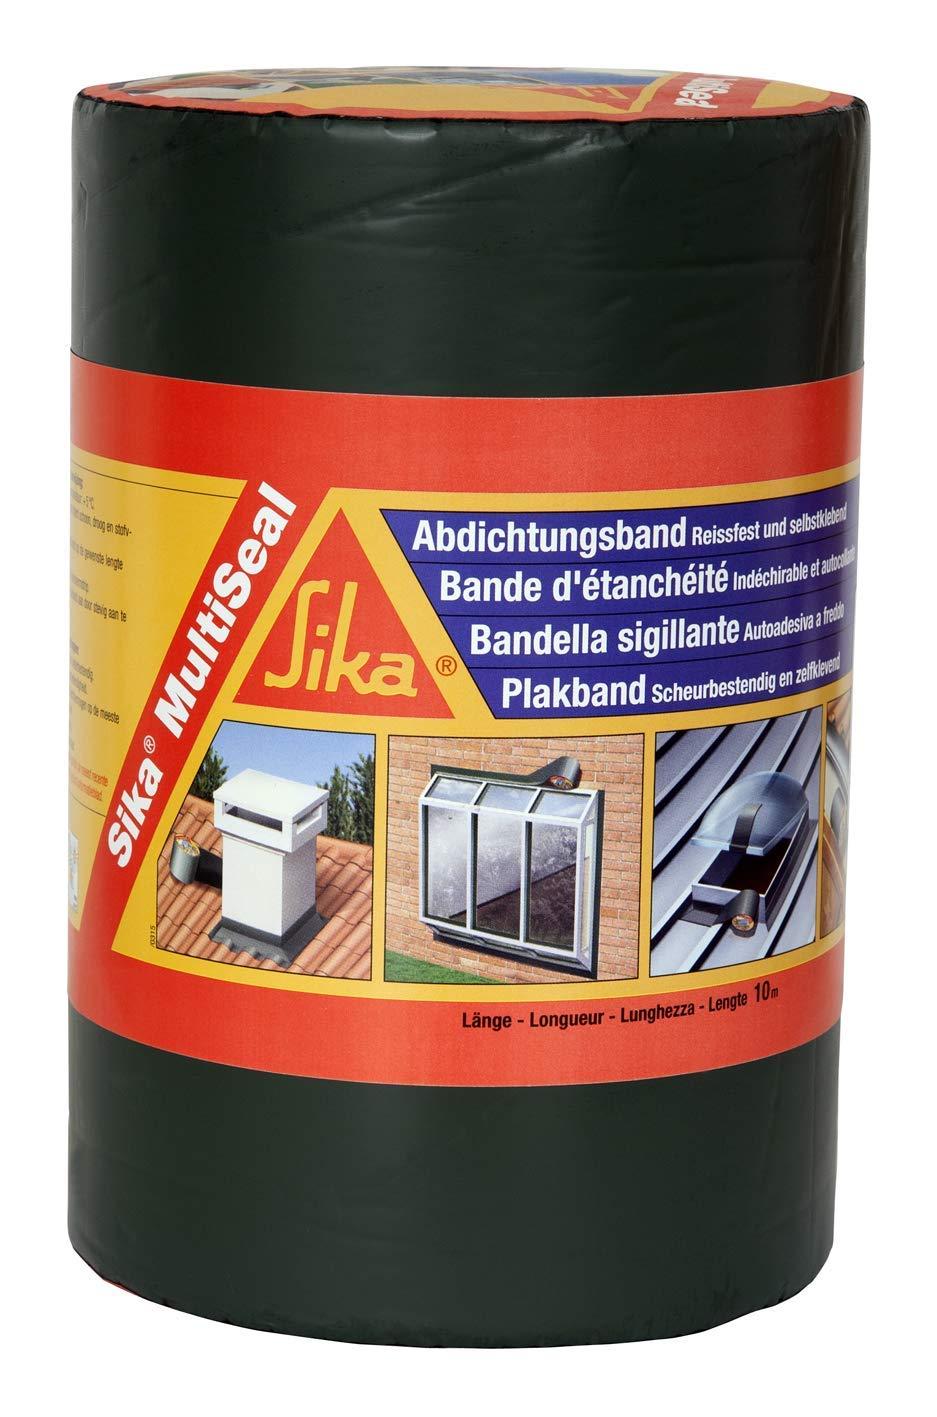 Sika Multiseal SG, Banda autoadhesiva impermeabilizante, Gris, 30cm x 12ml product image